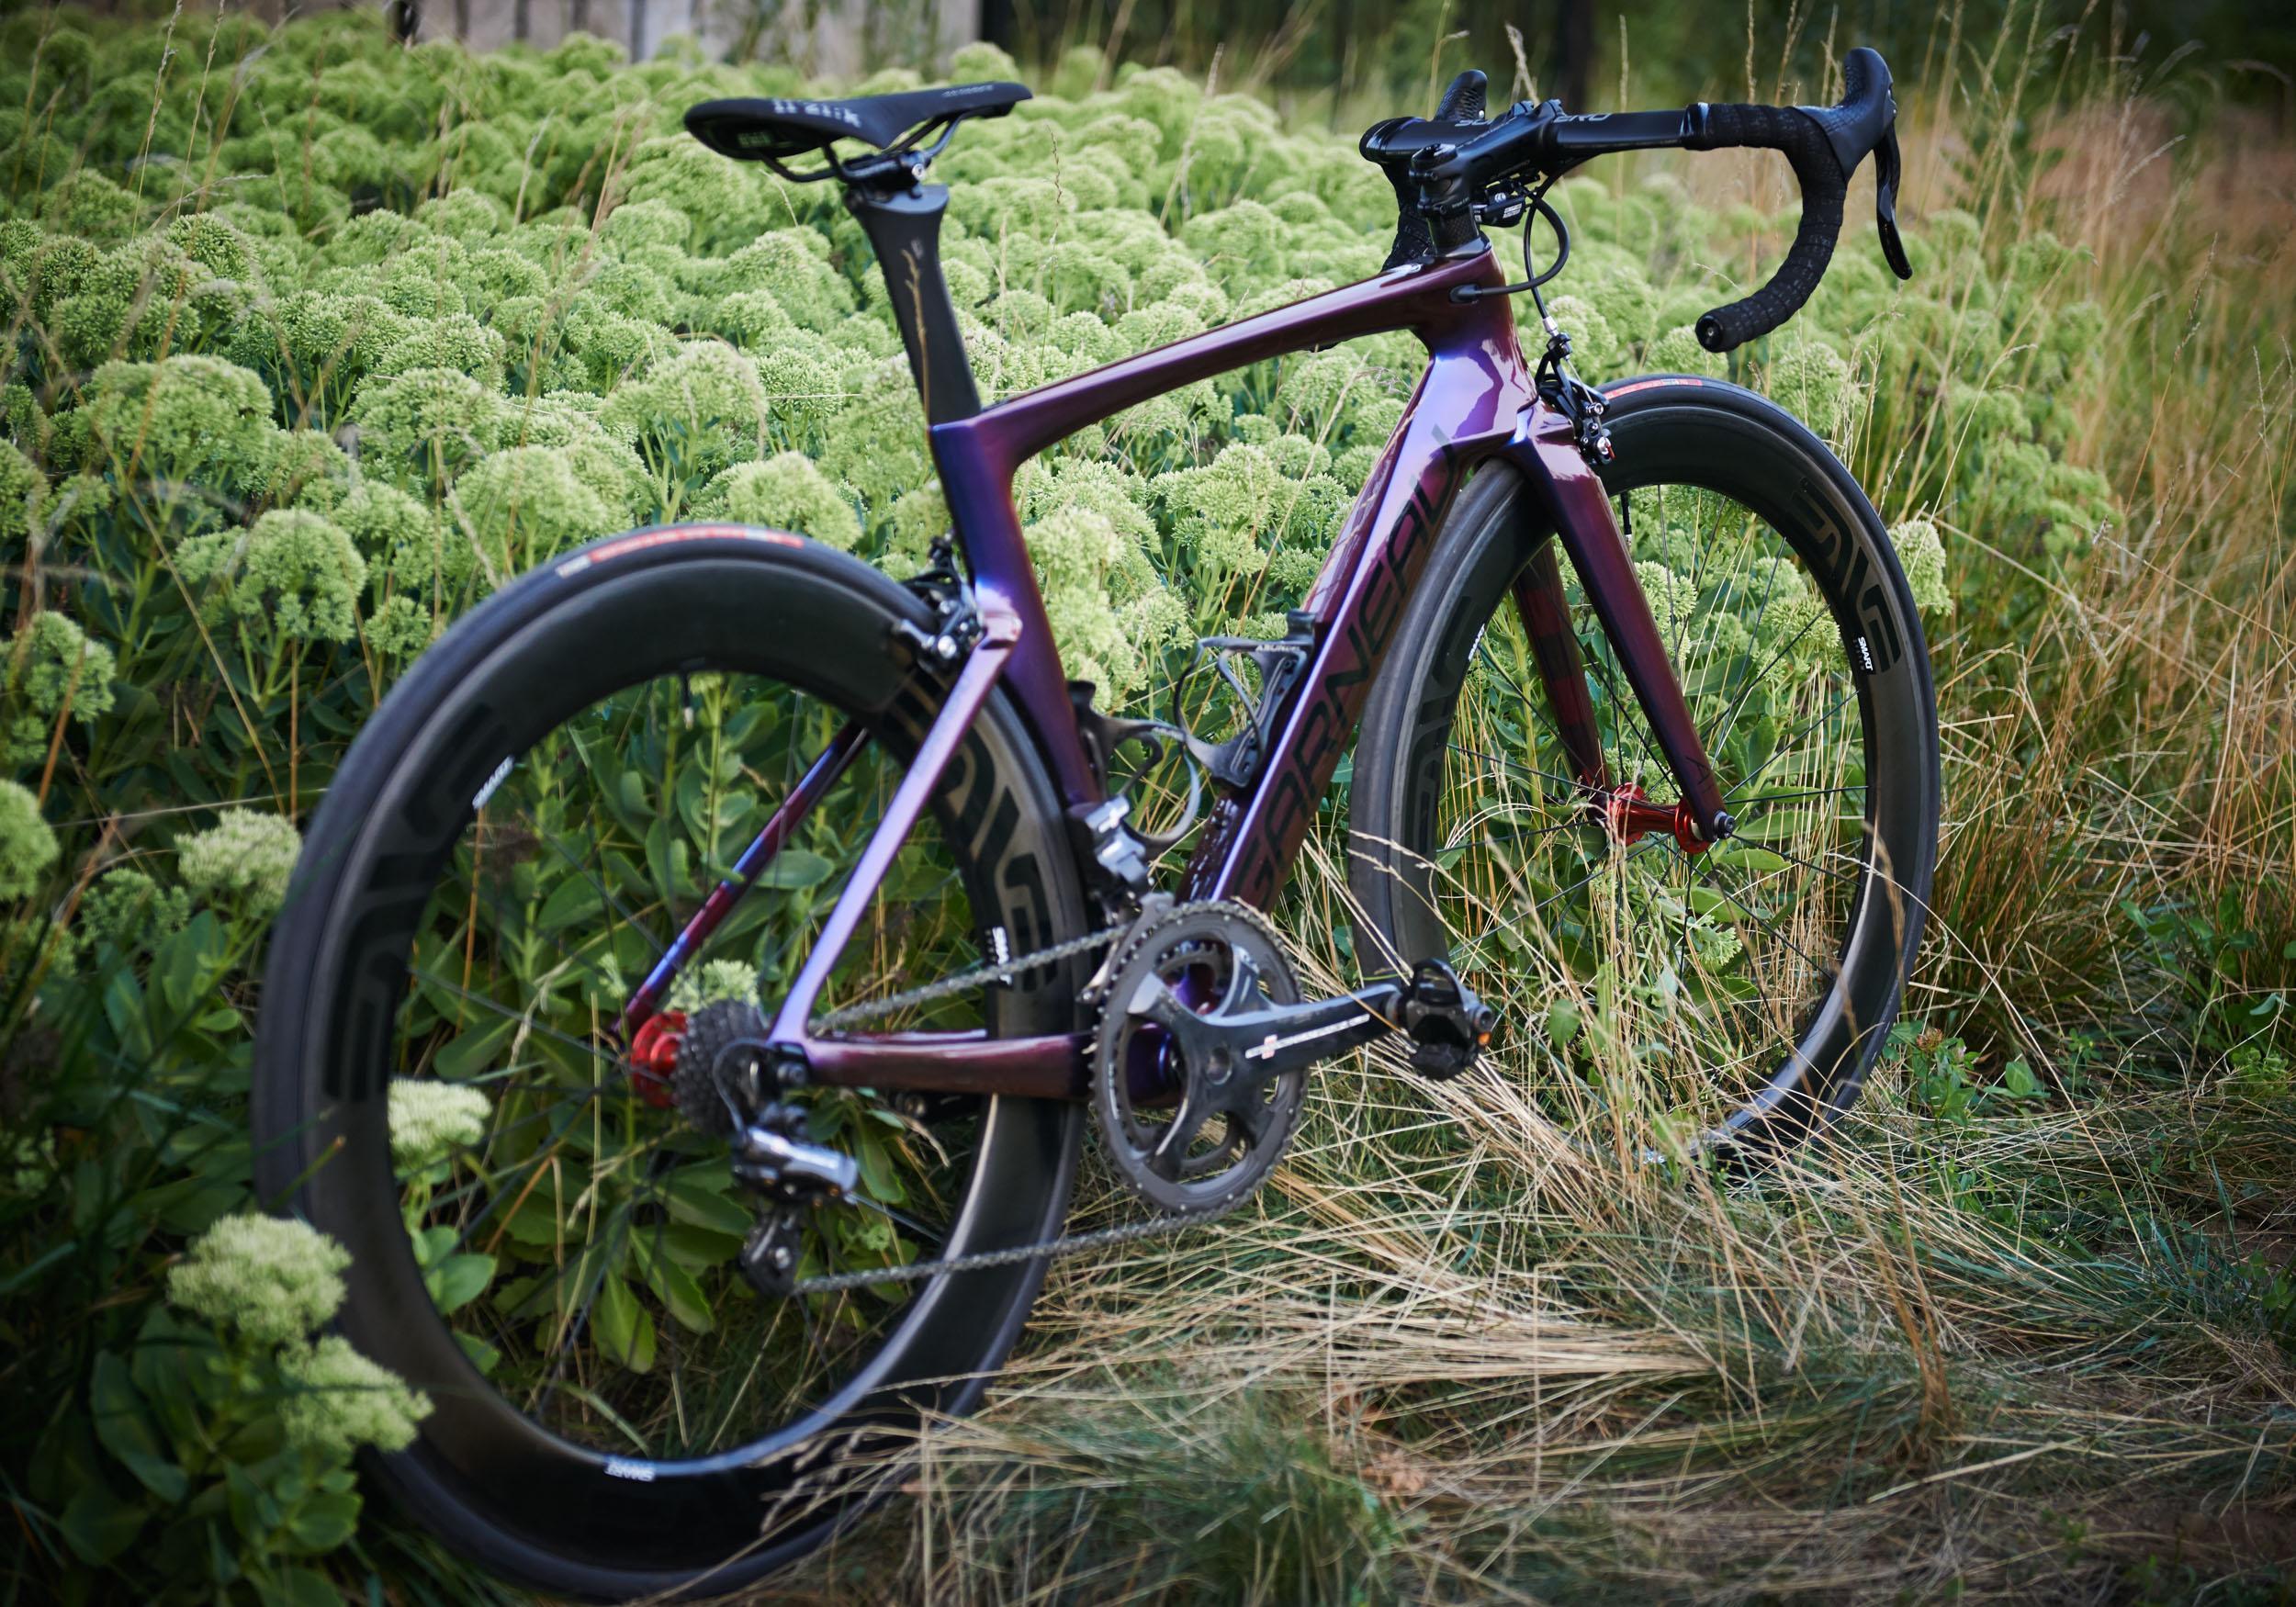 to-be-determined-garneau-a1-bike-review-112.jpg